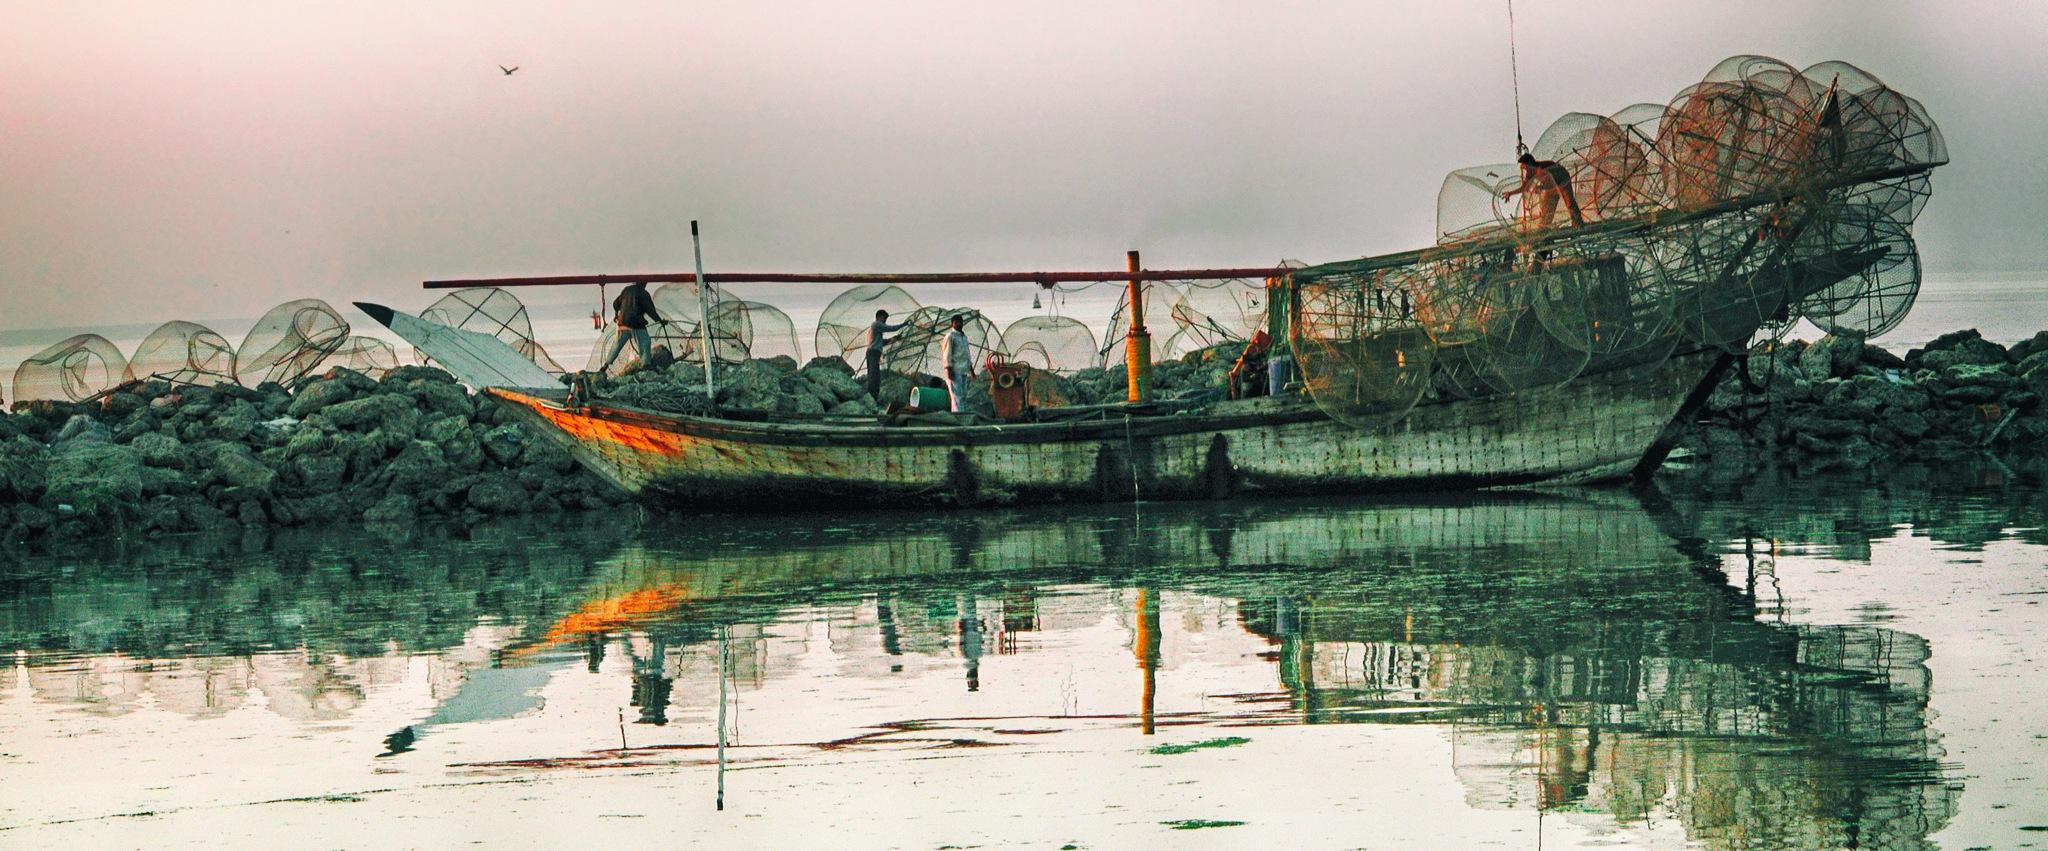 Remains of a day by Hisham Badran